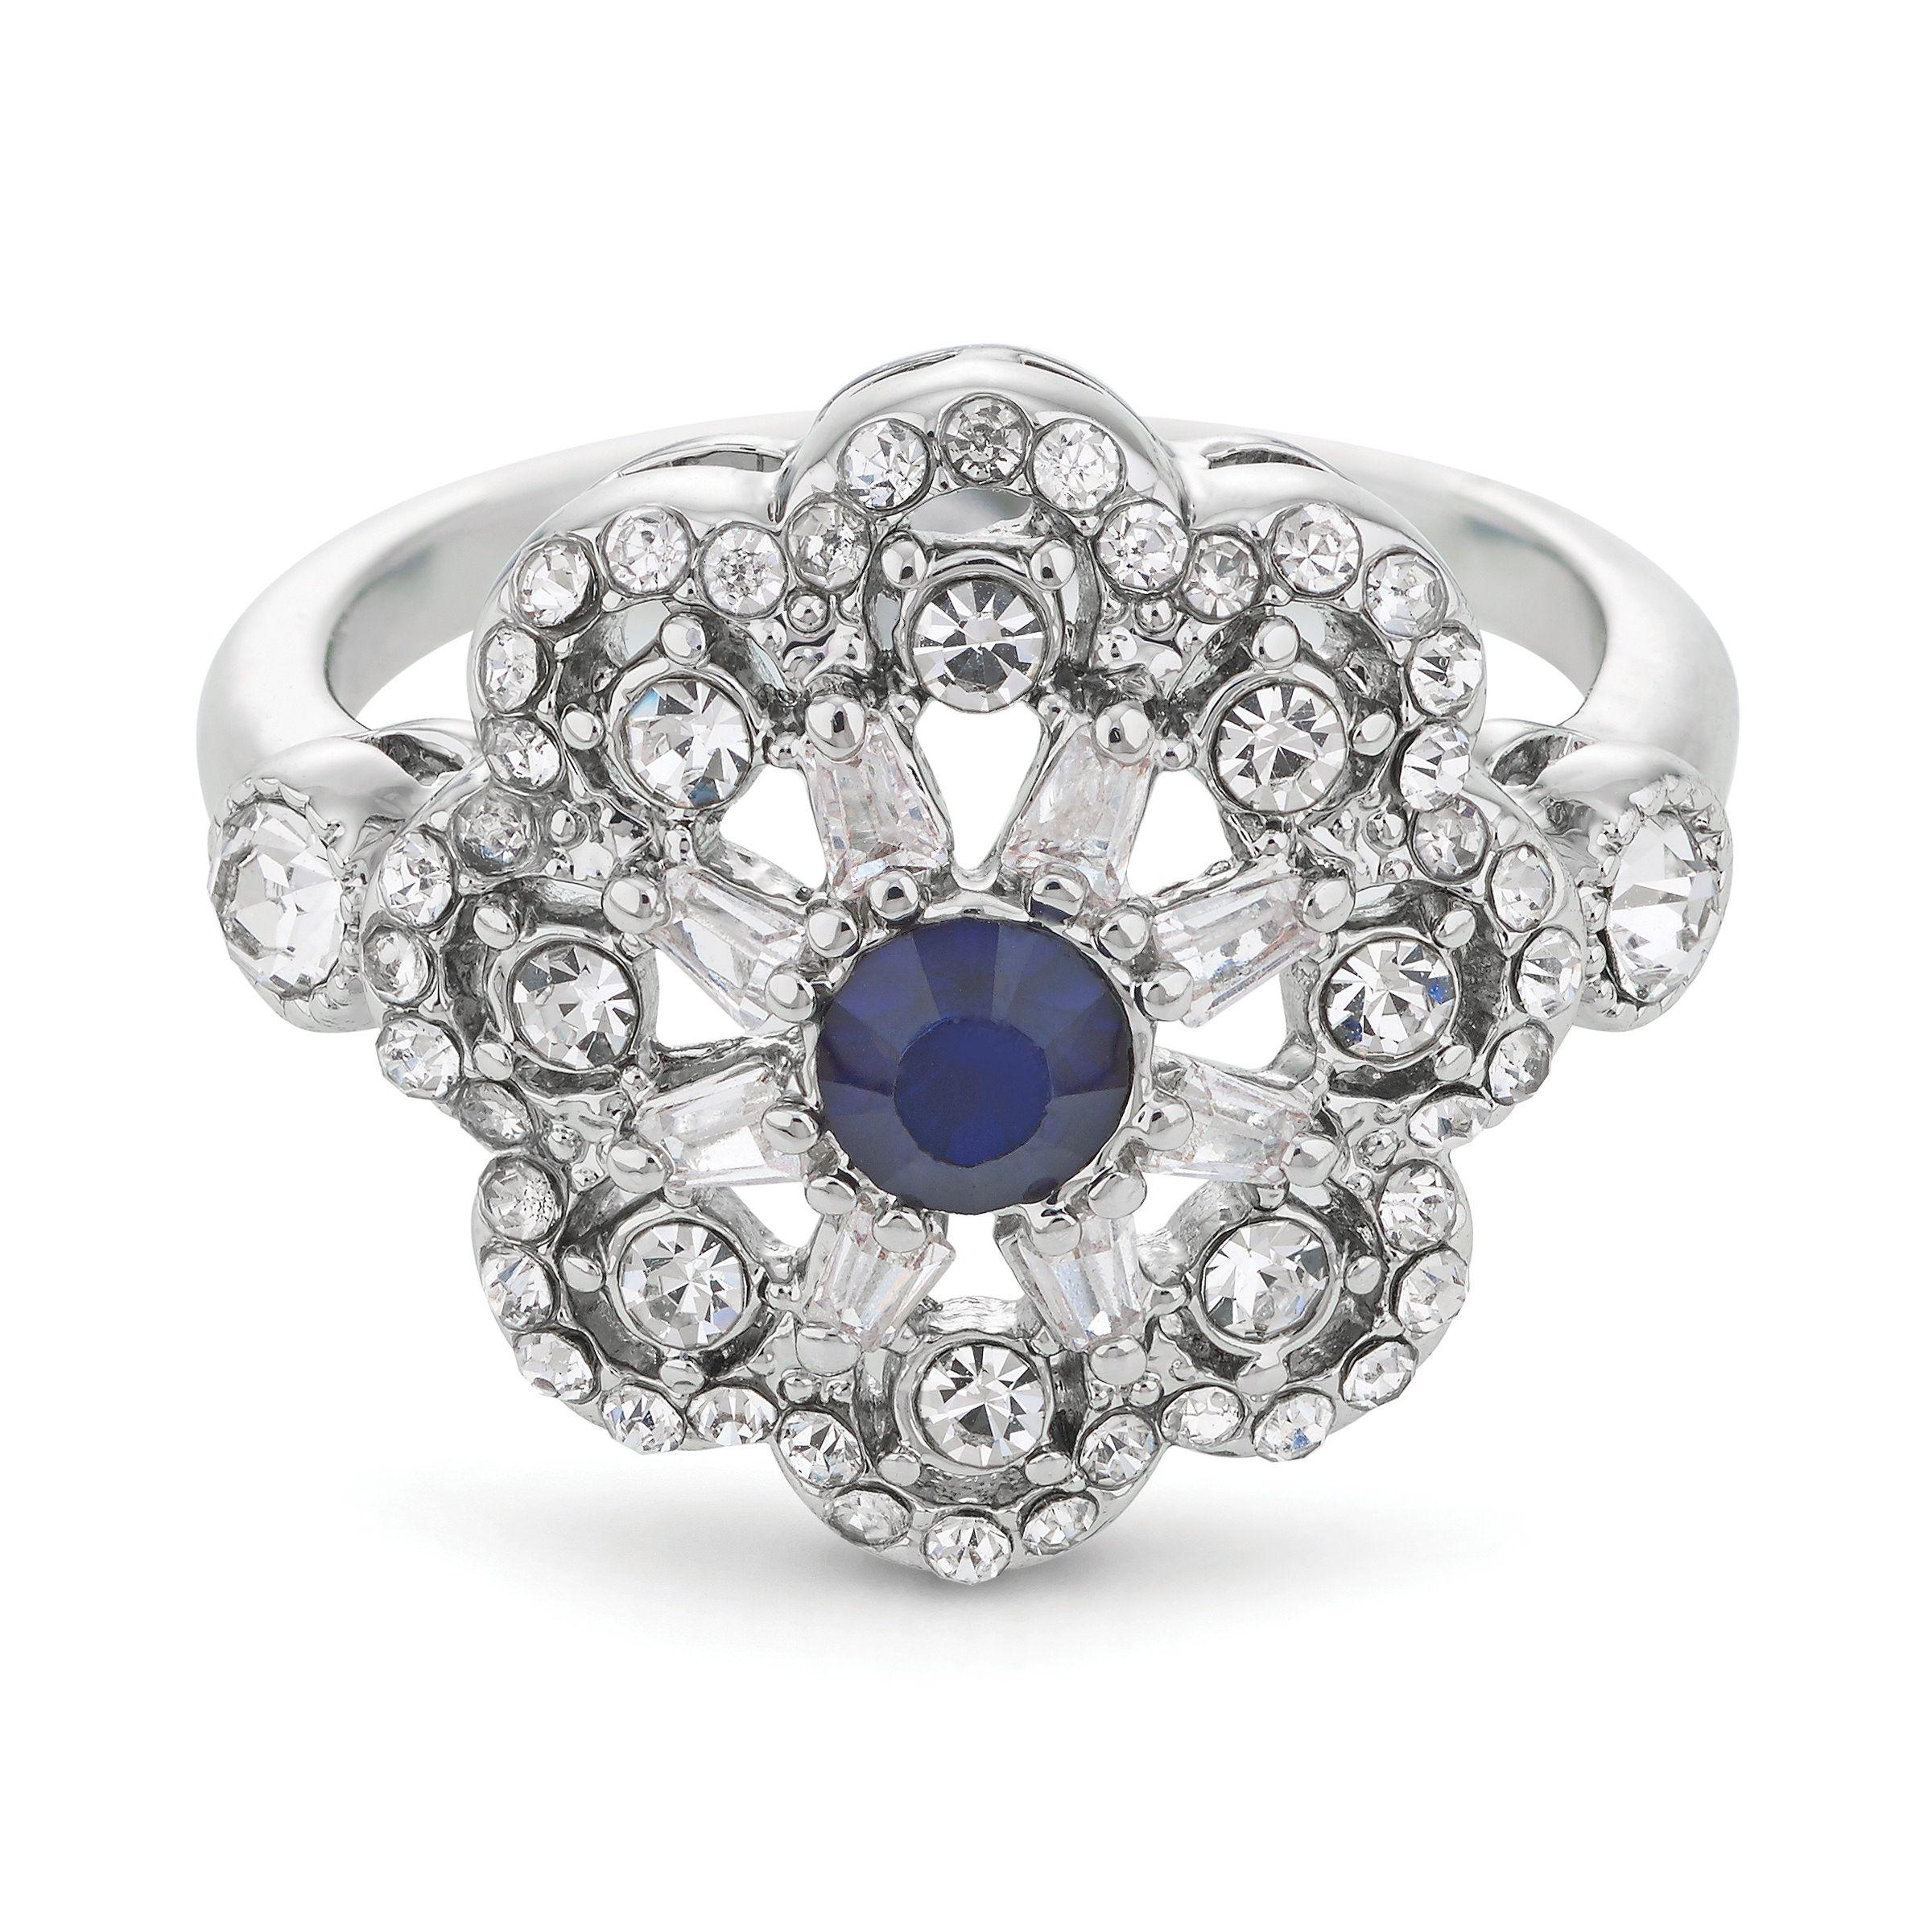 Buckley London Vintage Style Flower Ring